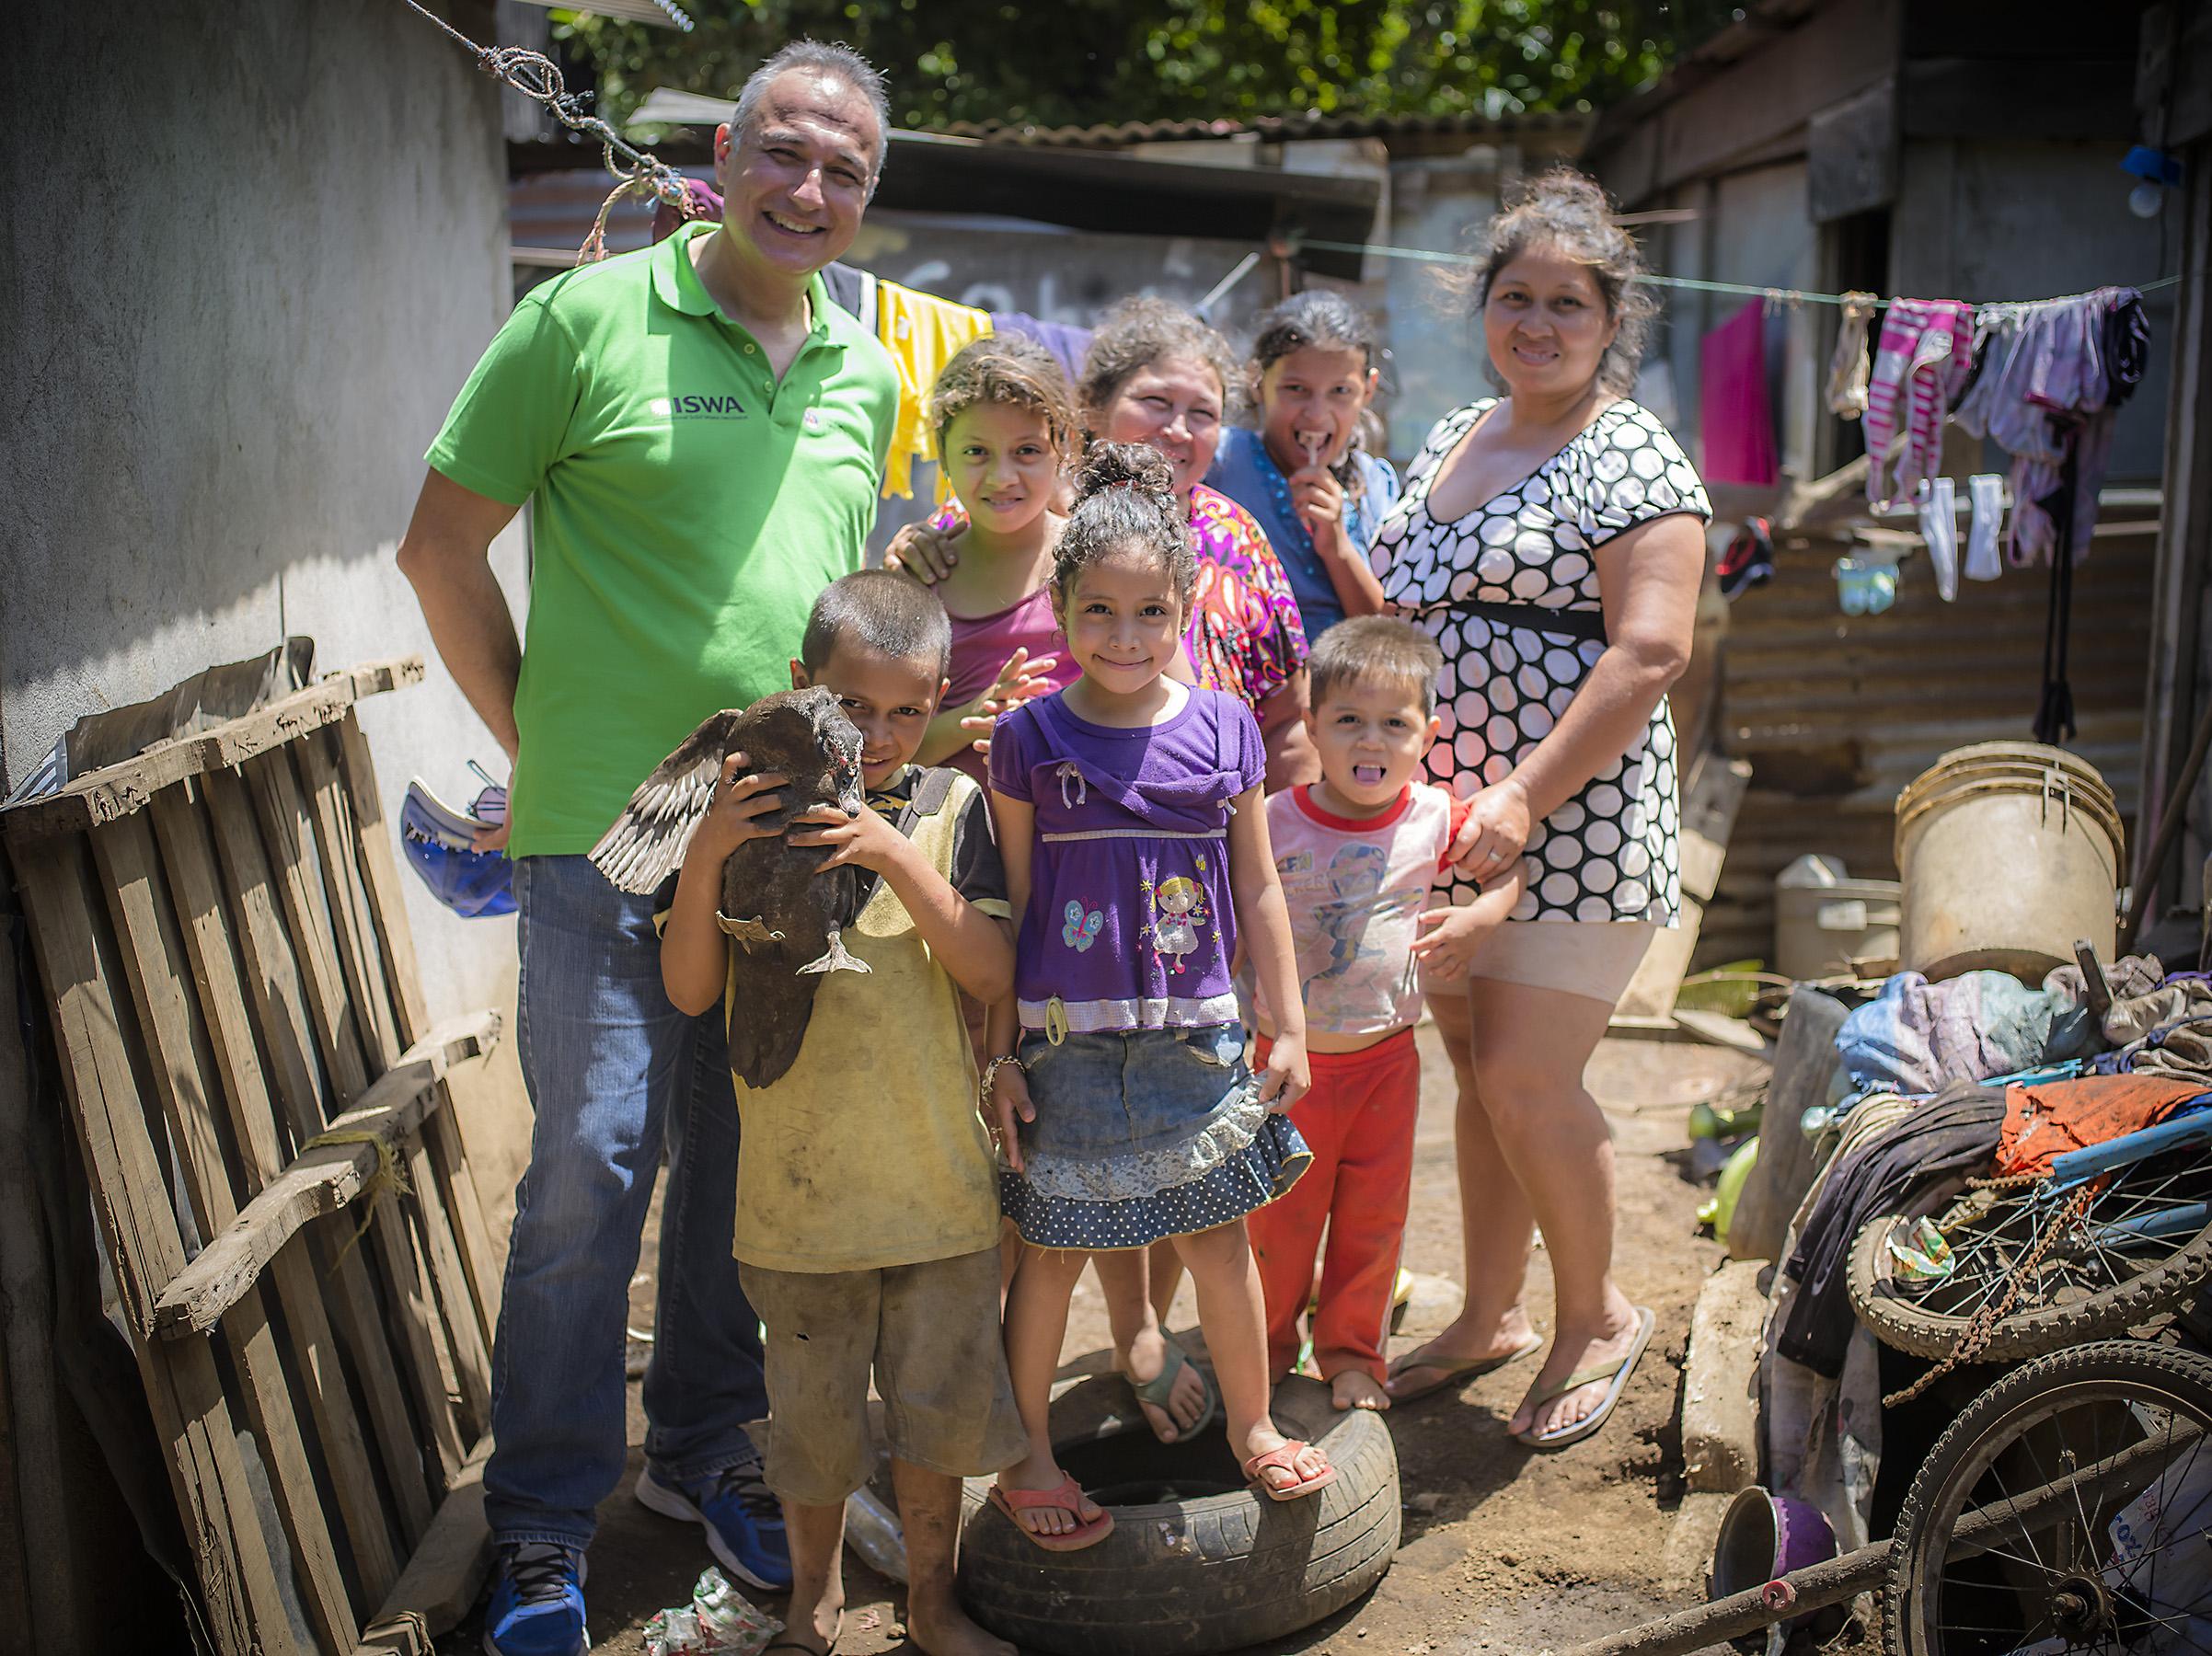 Antonis in Nueva Vida with Josephina, Marcia, Siara, Norlan, Pedro, and Fernanda. We have 6 scholarship kids from this area.